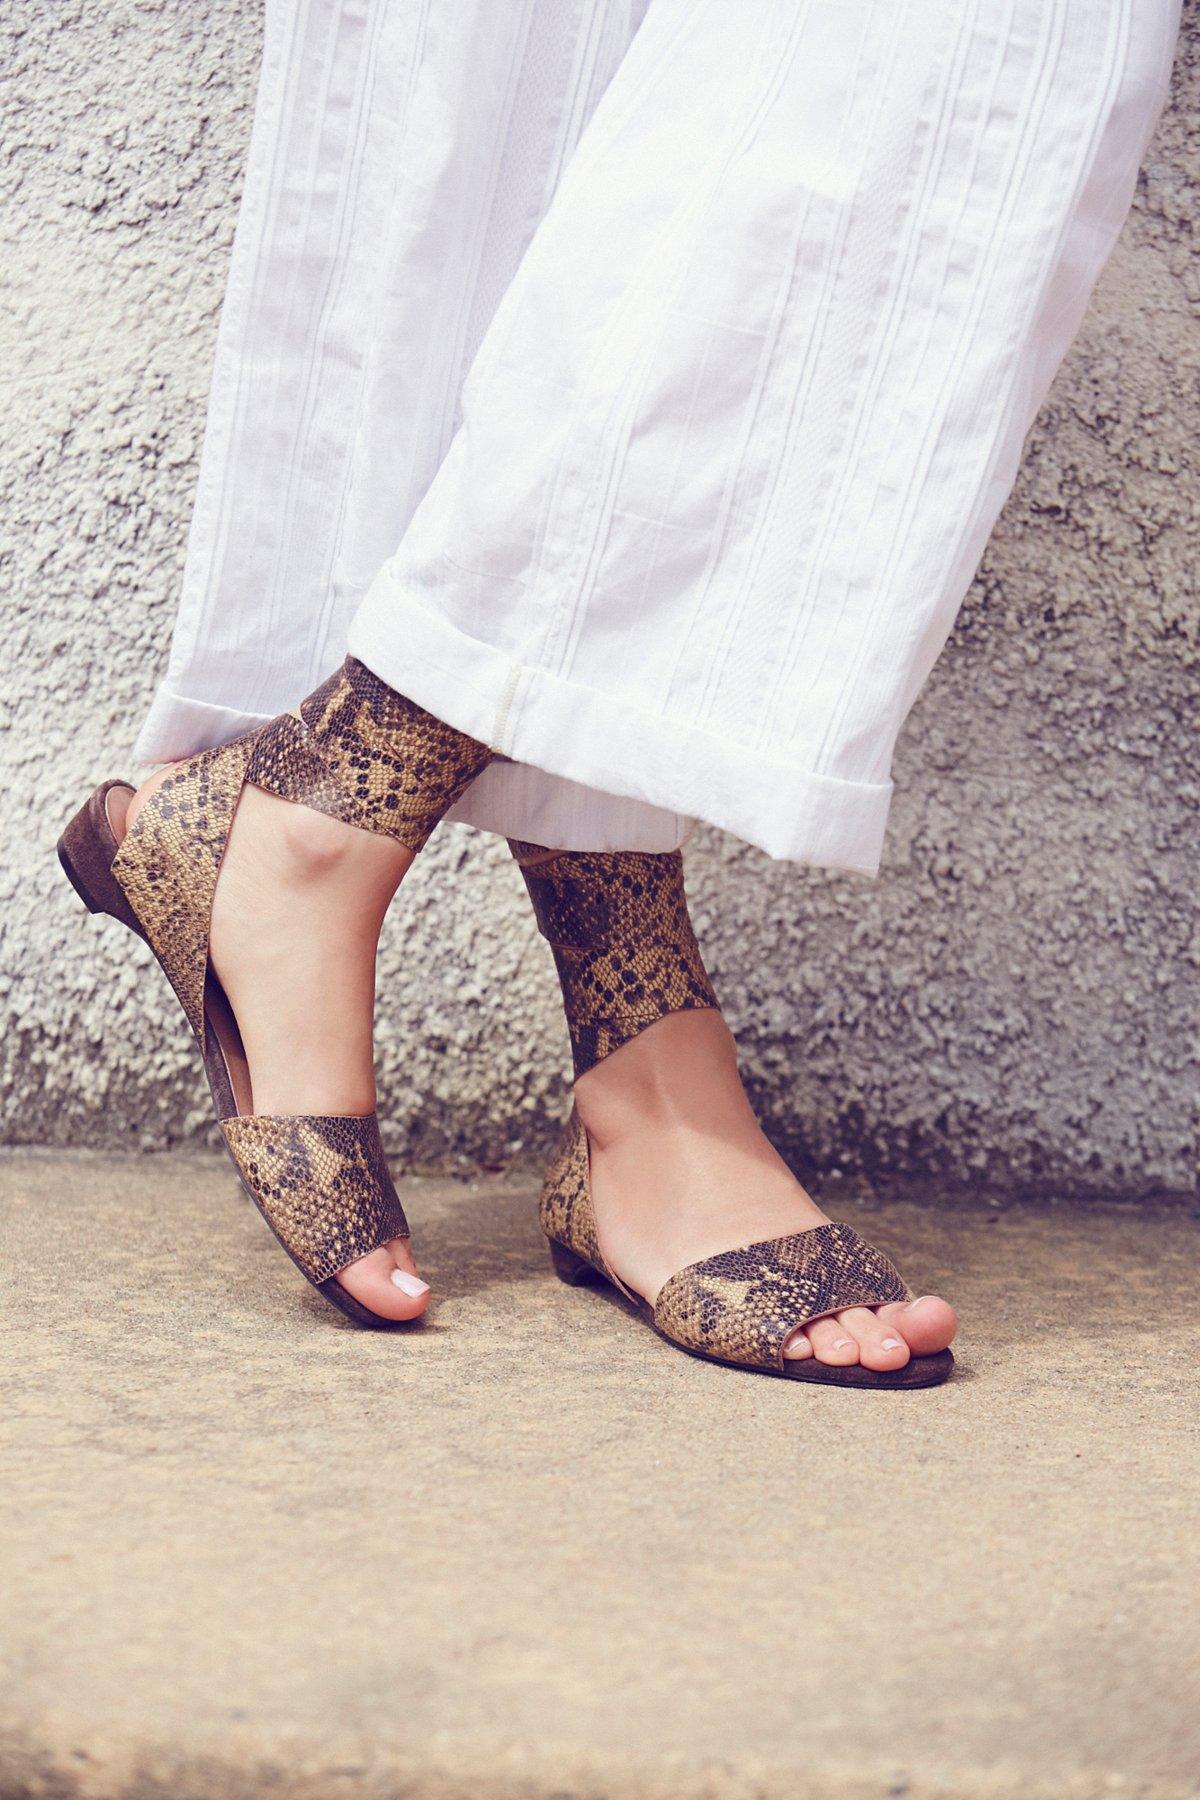 April缠绕式平底鞋